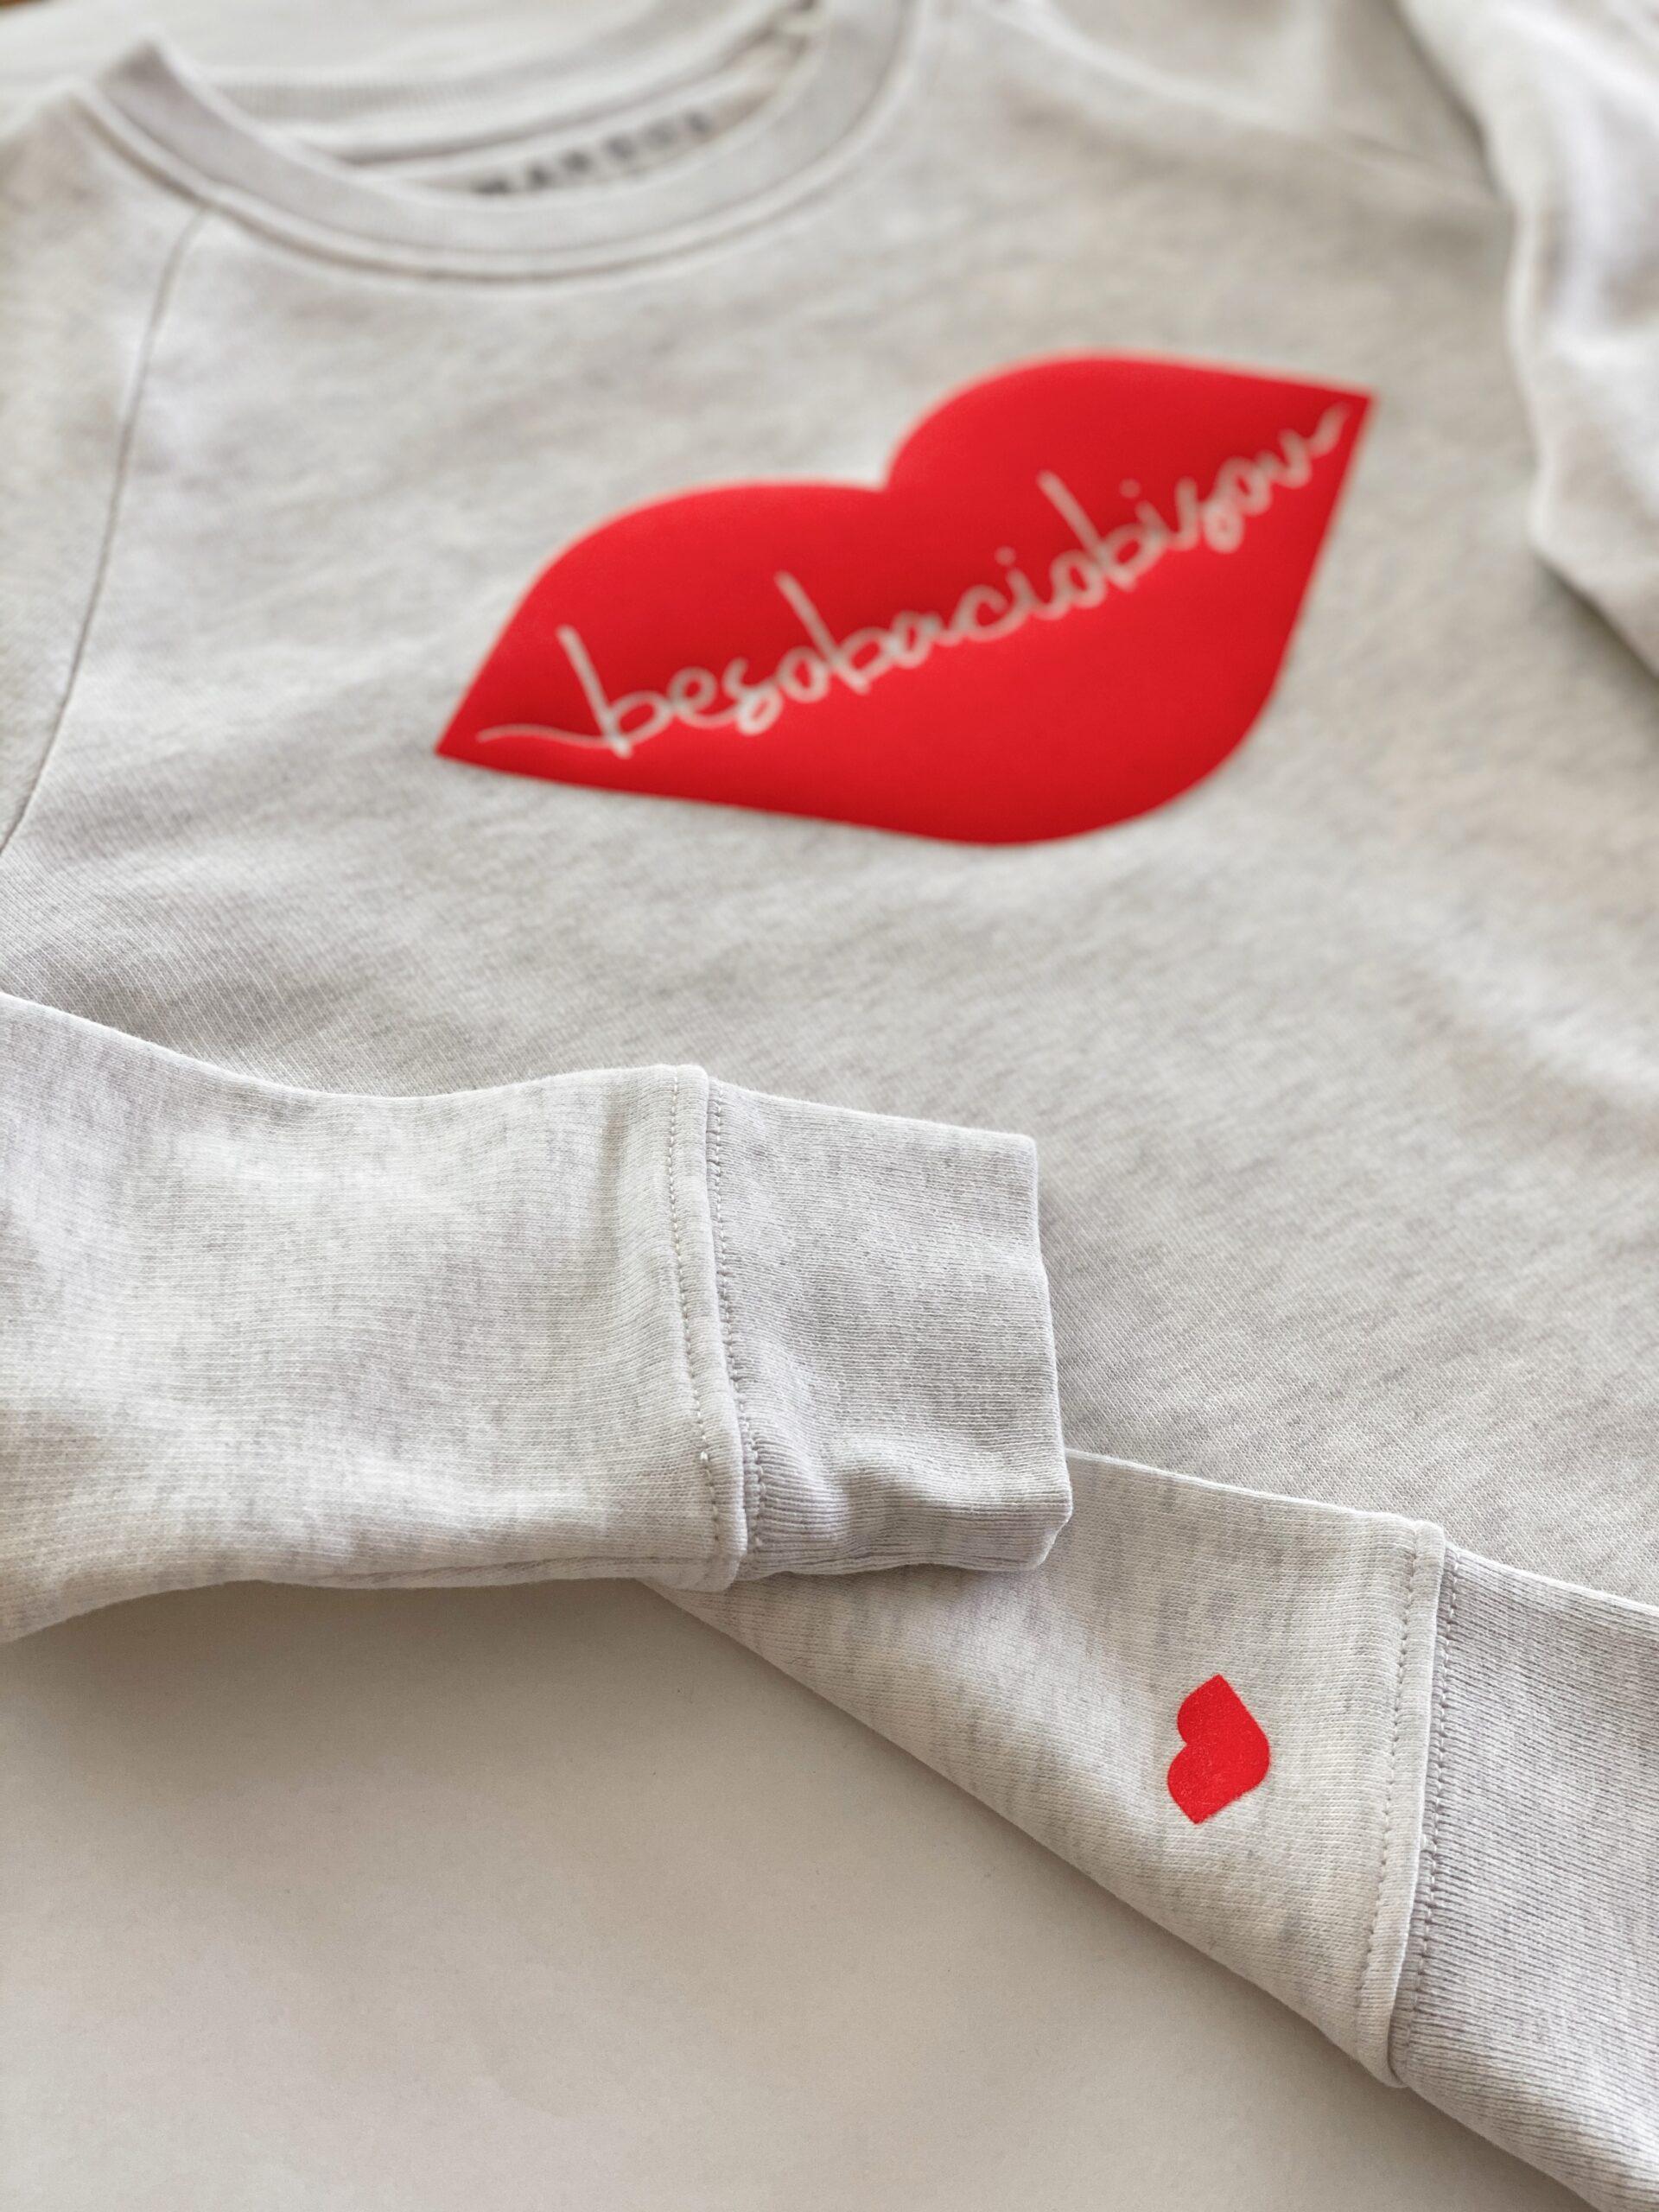 Beso, bacio, bisou sweater by Mangos on Monday